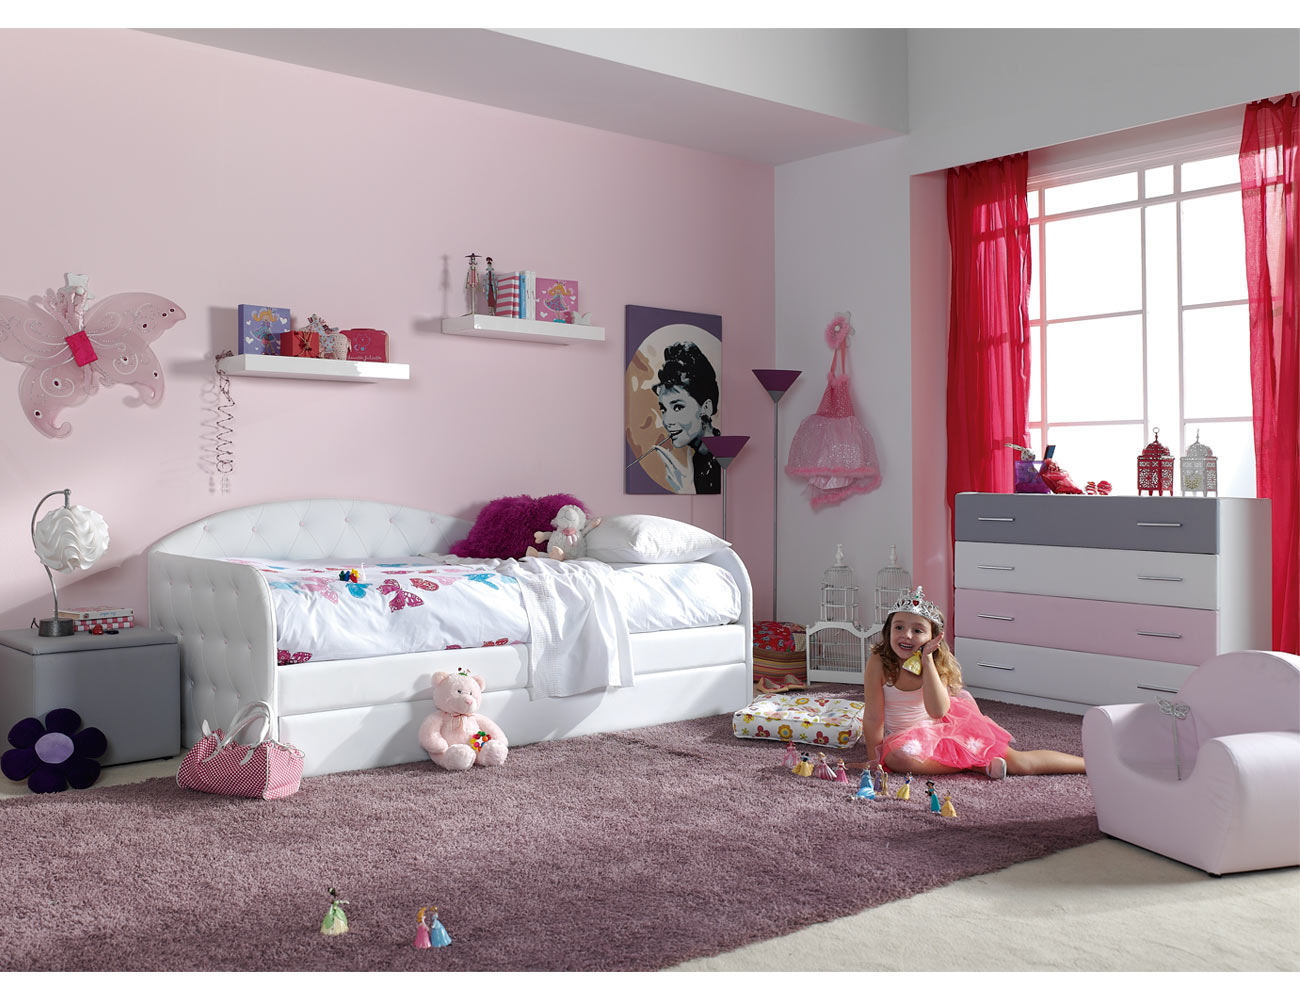 243 cama nido20